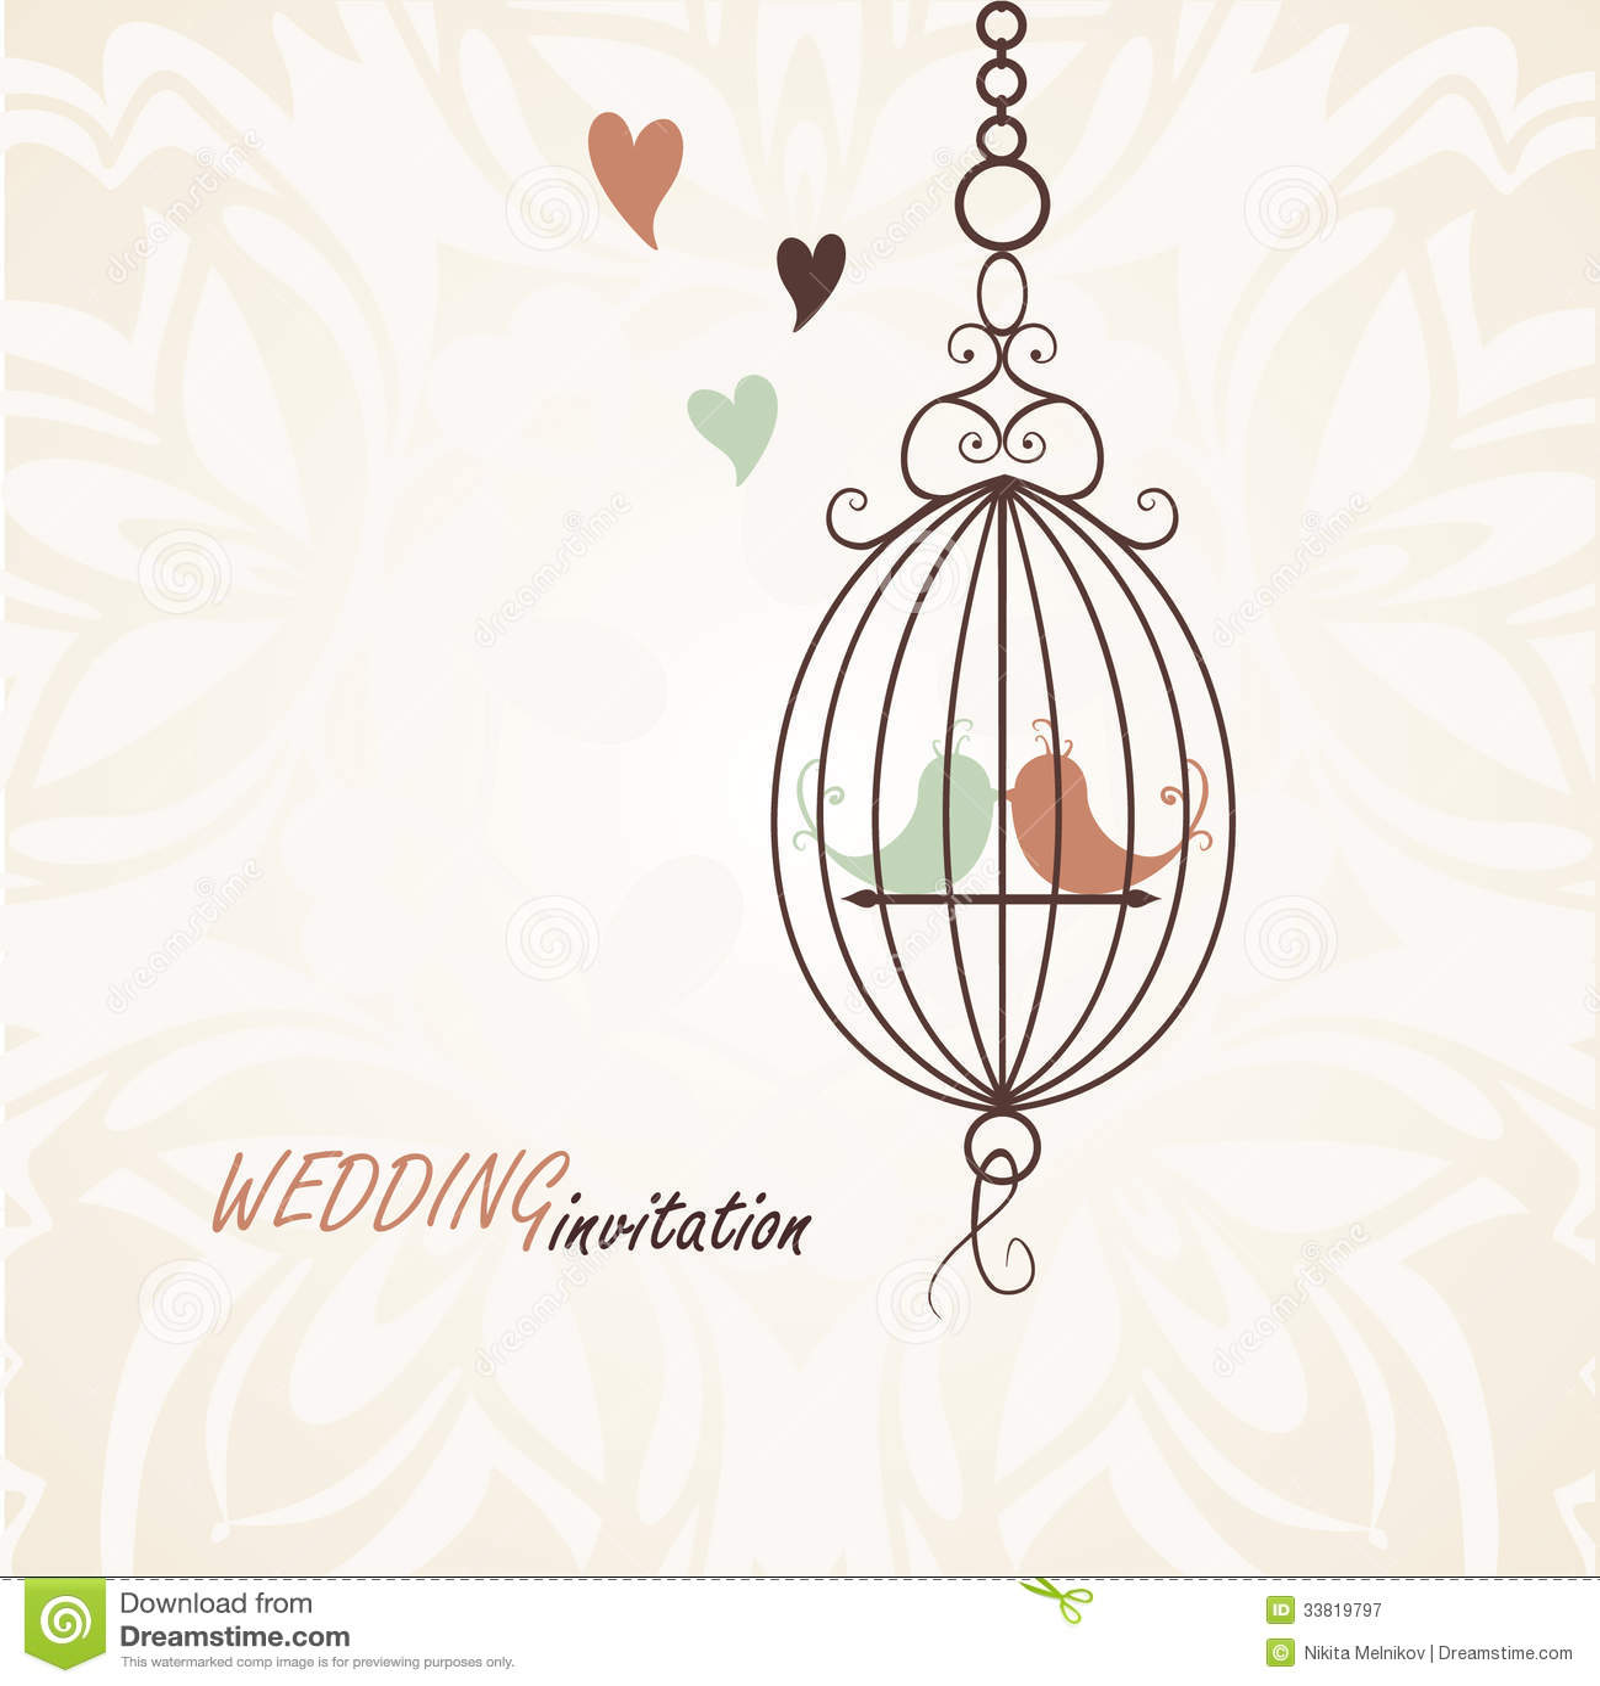 Pattern For Wedding Invitation Stock Vector - Illustration of ...